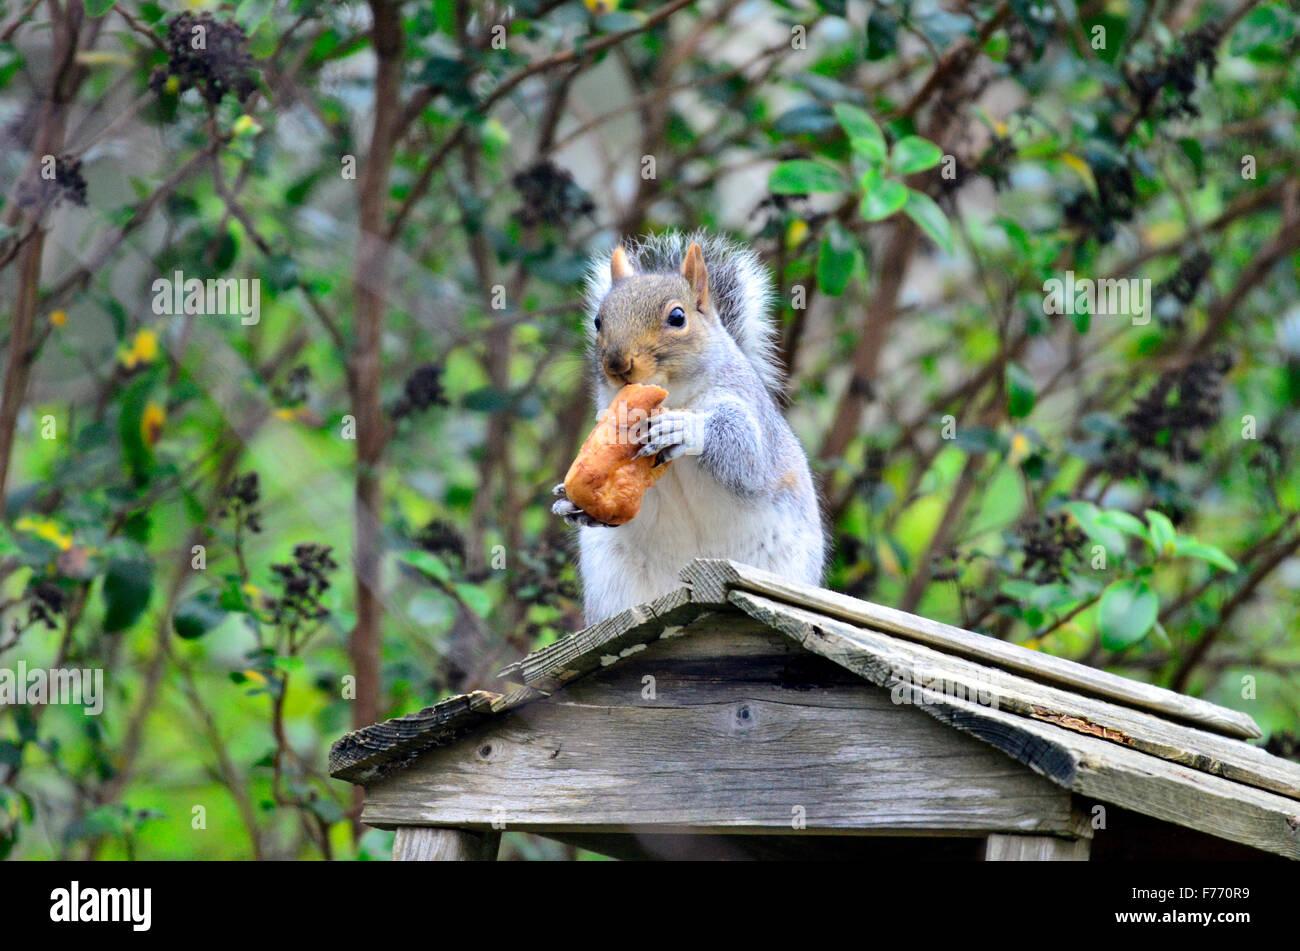 Bristol, UK. 26th Nov, 2015. UK Weather/Wildlife. Hungry Squirrel, having raided a bird table containing bird seed - Stock Image